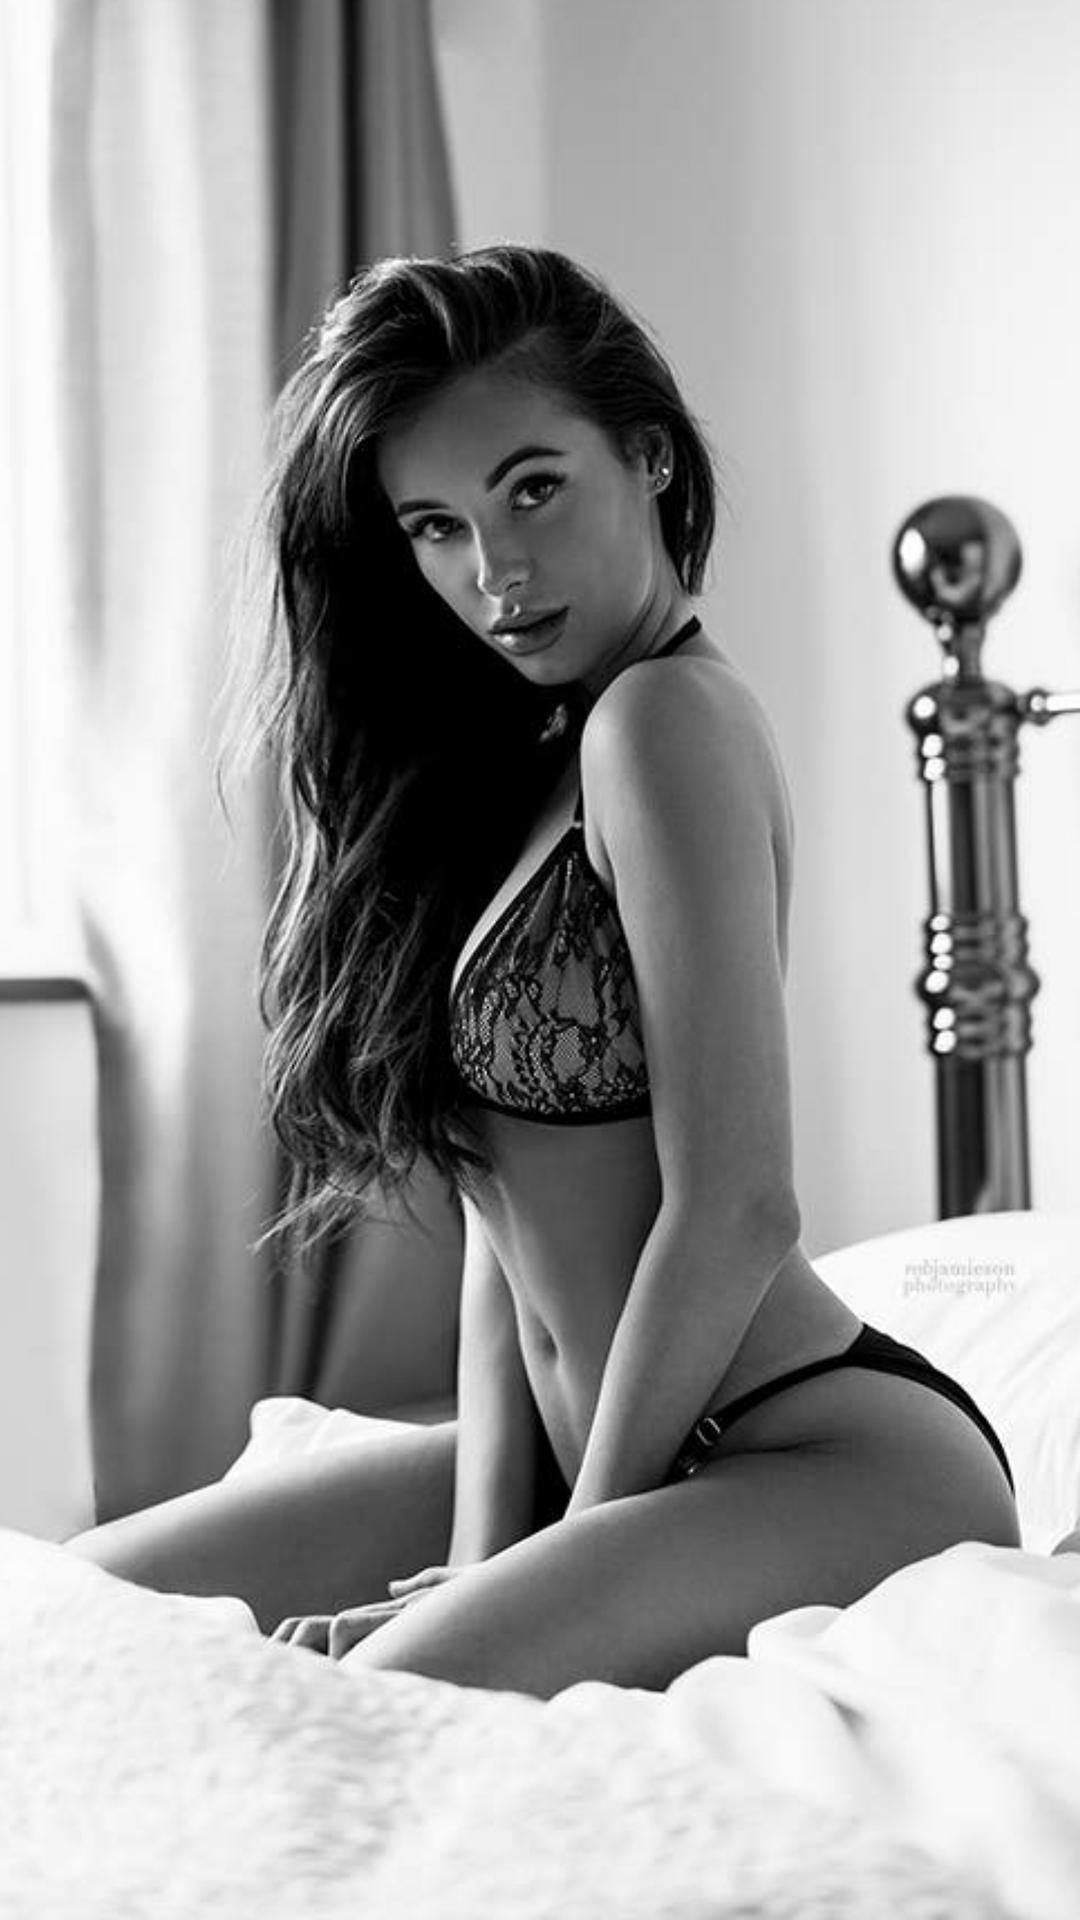 girl sexy fashion lingerie model monochrome beautiful people portrait nude glamour